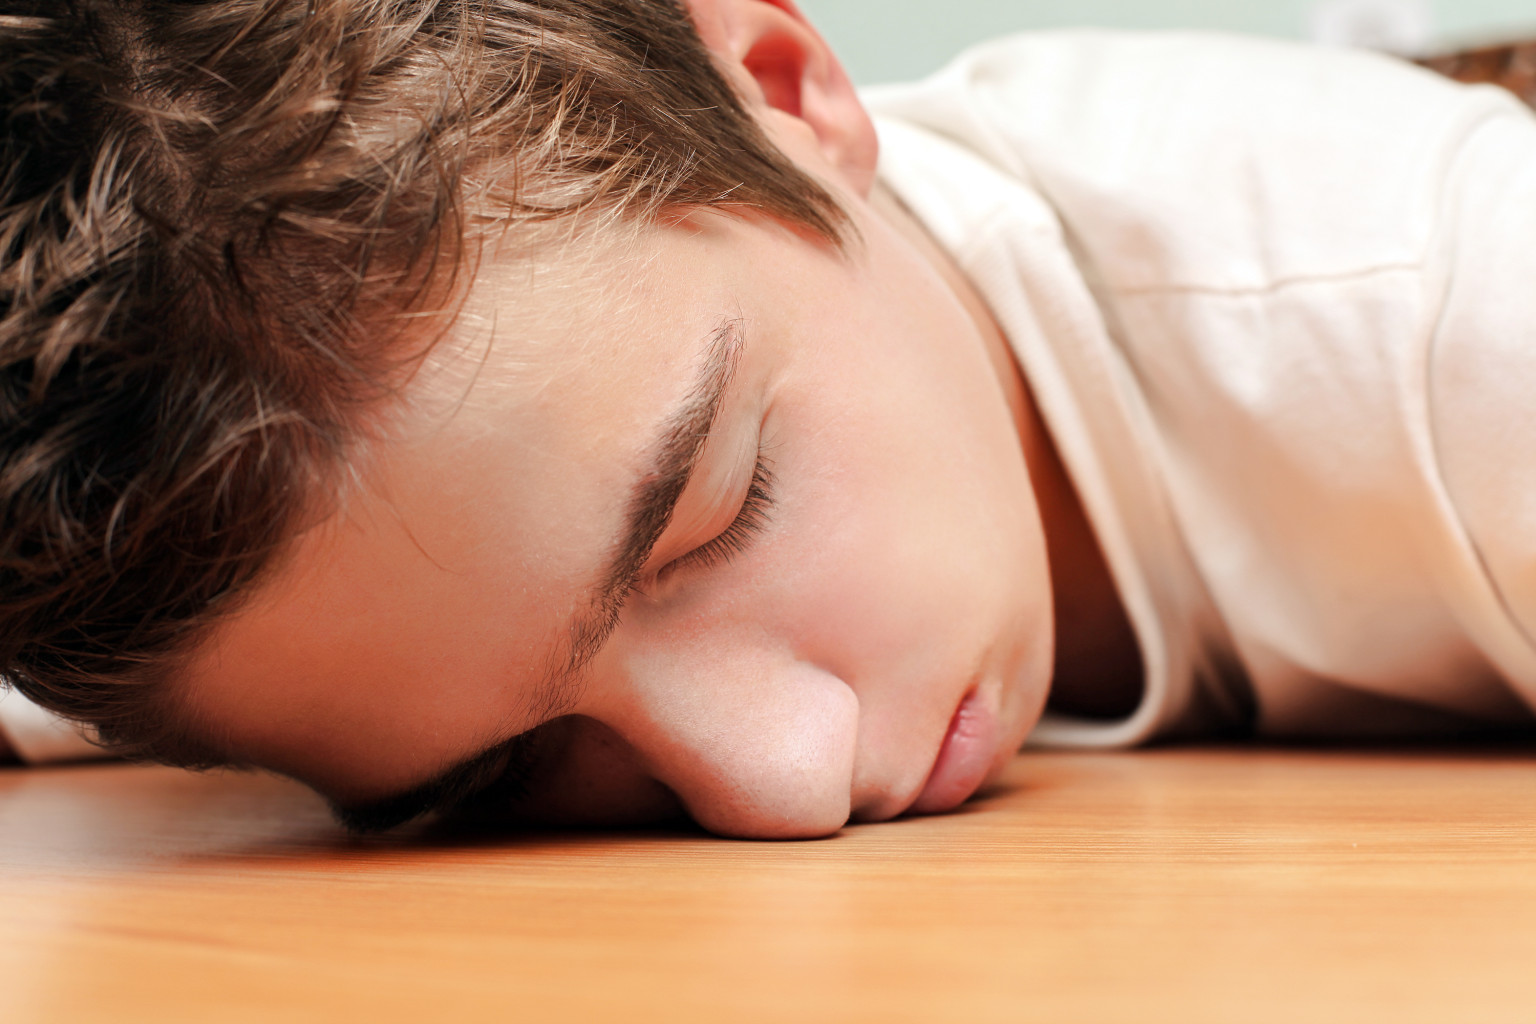 Teen Sleeping Habits Discussed News 42